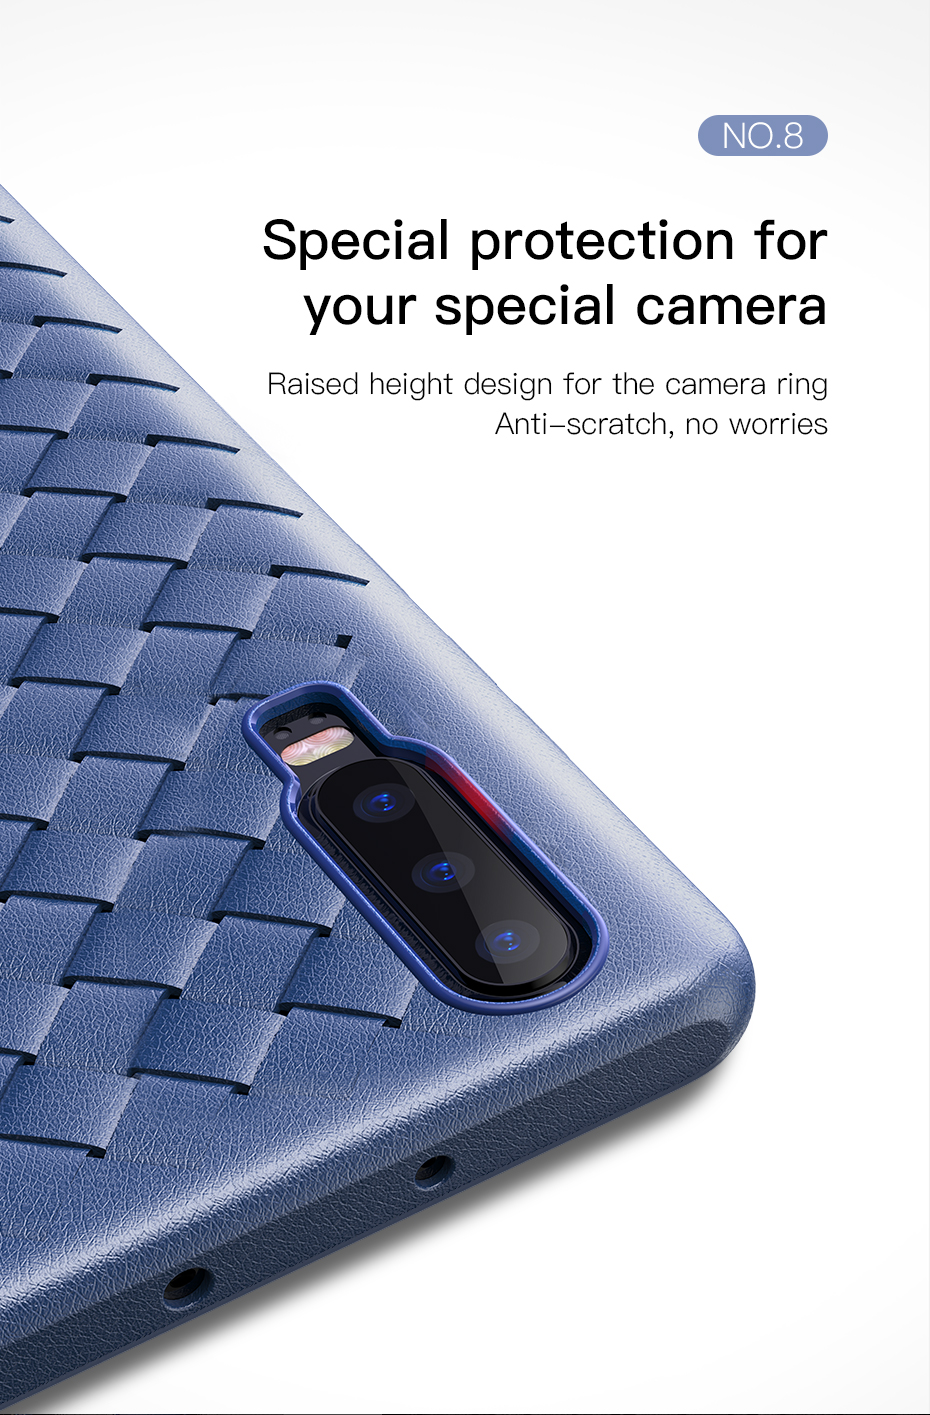 ASTROSOAR Baseus BV Weaving Soft Shock-resistant Case for Huawei P20